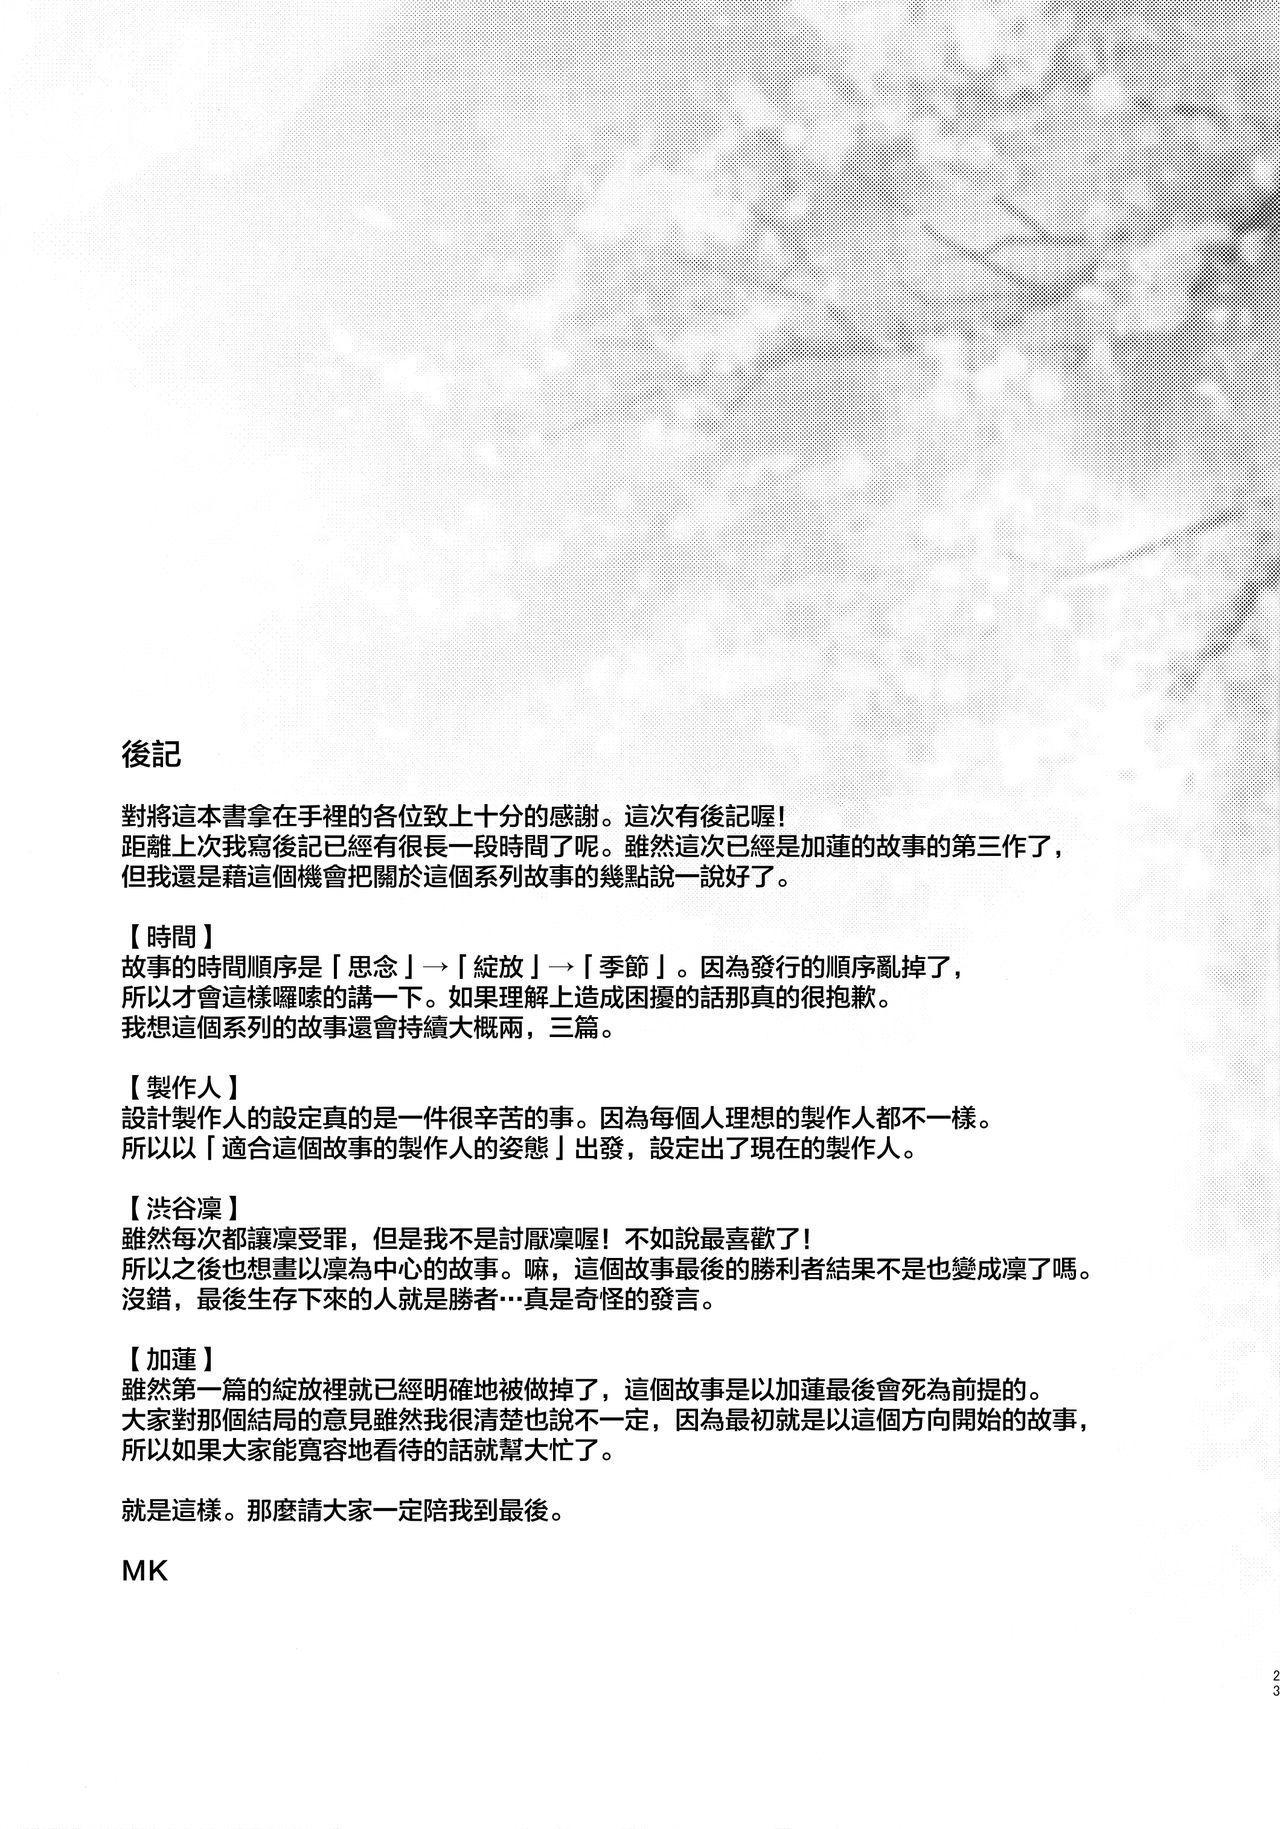 Omoi no Aridokoro | 思念之所在 23